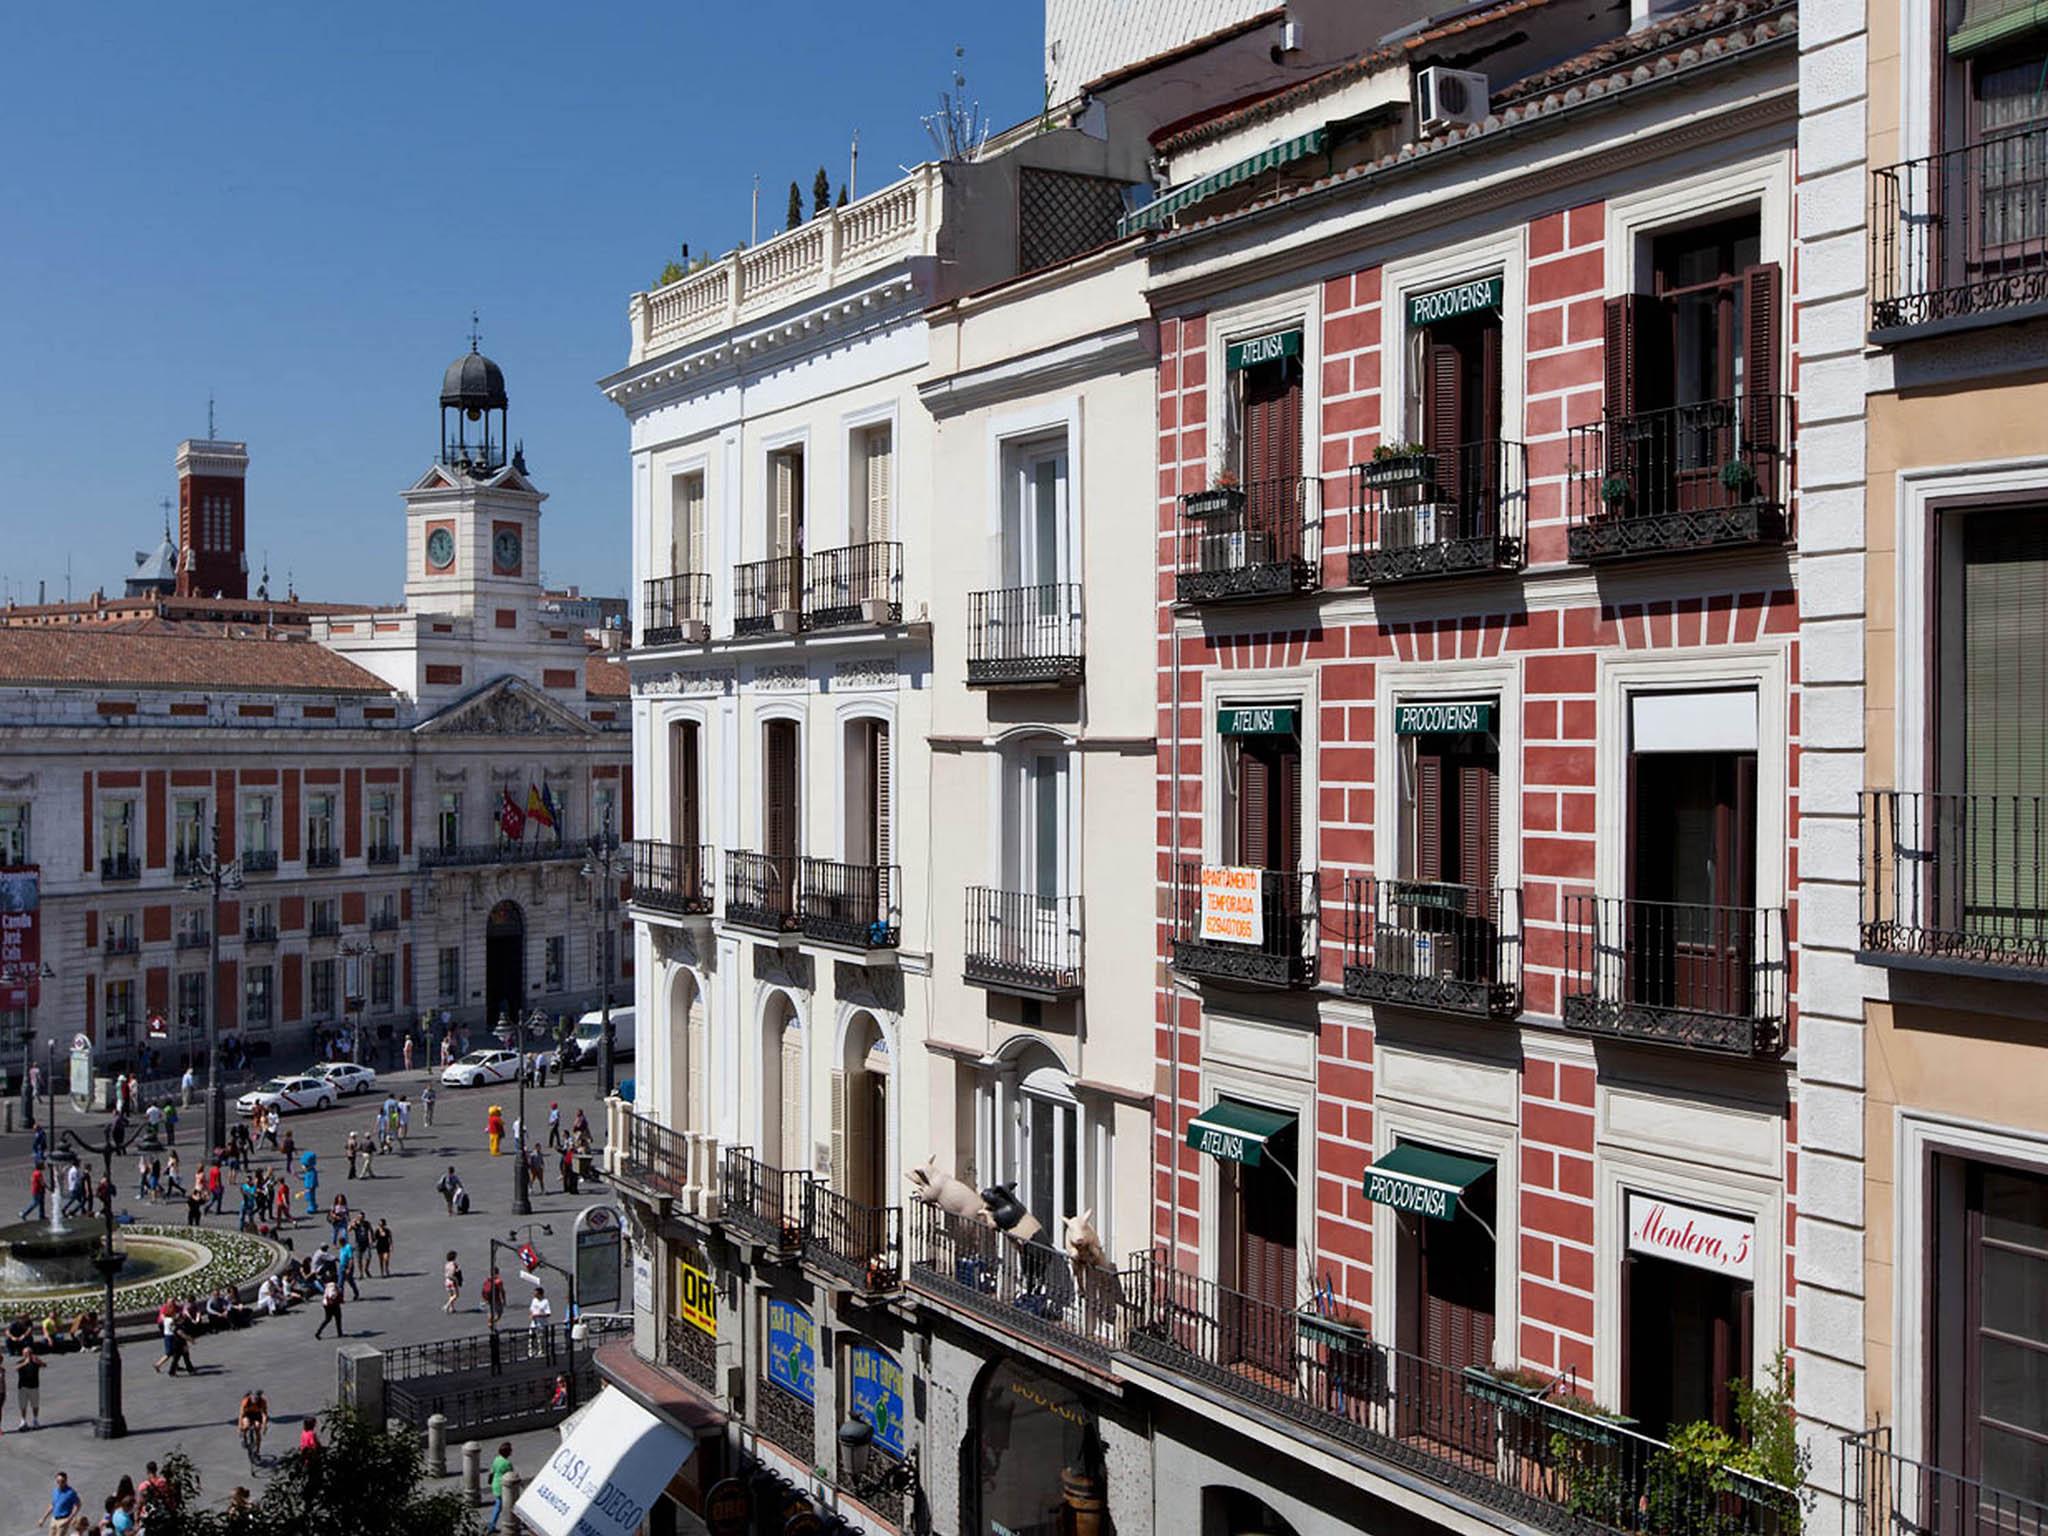 Hotel en madrid el mirador de la puerta del sol for Puerta del sol madrid fotos